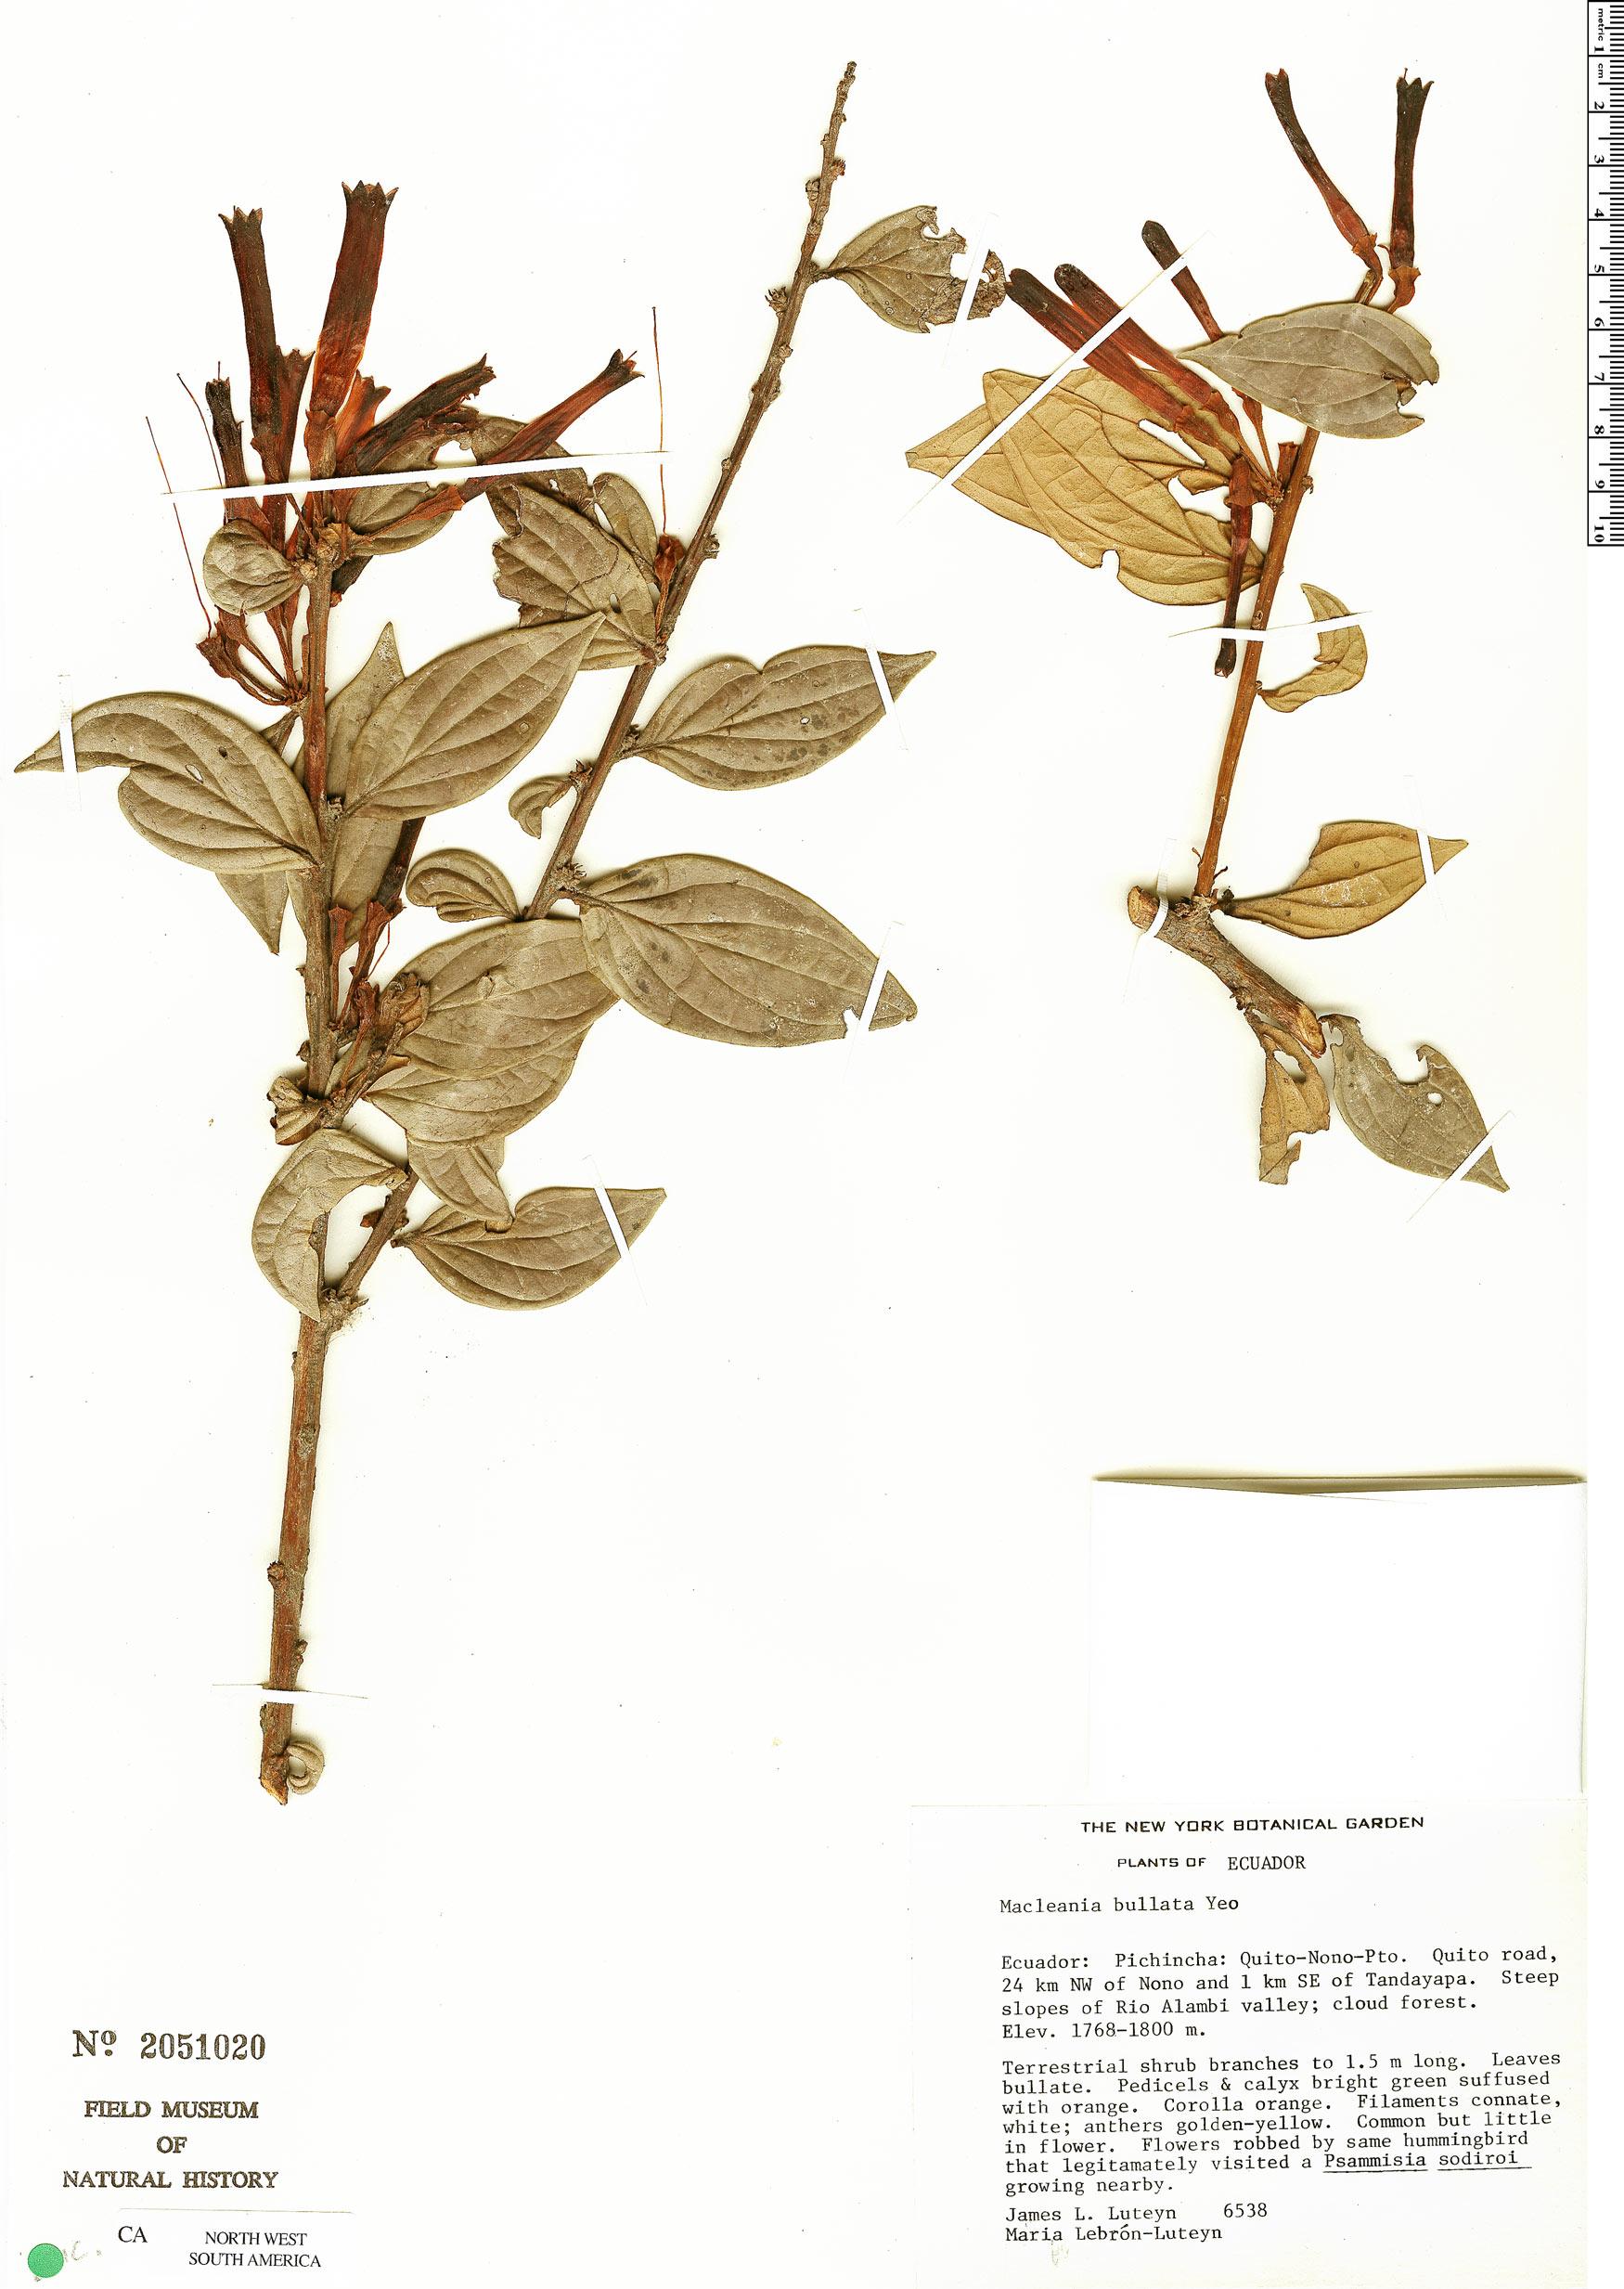 Specimen: Macleania bullata